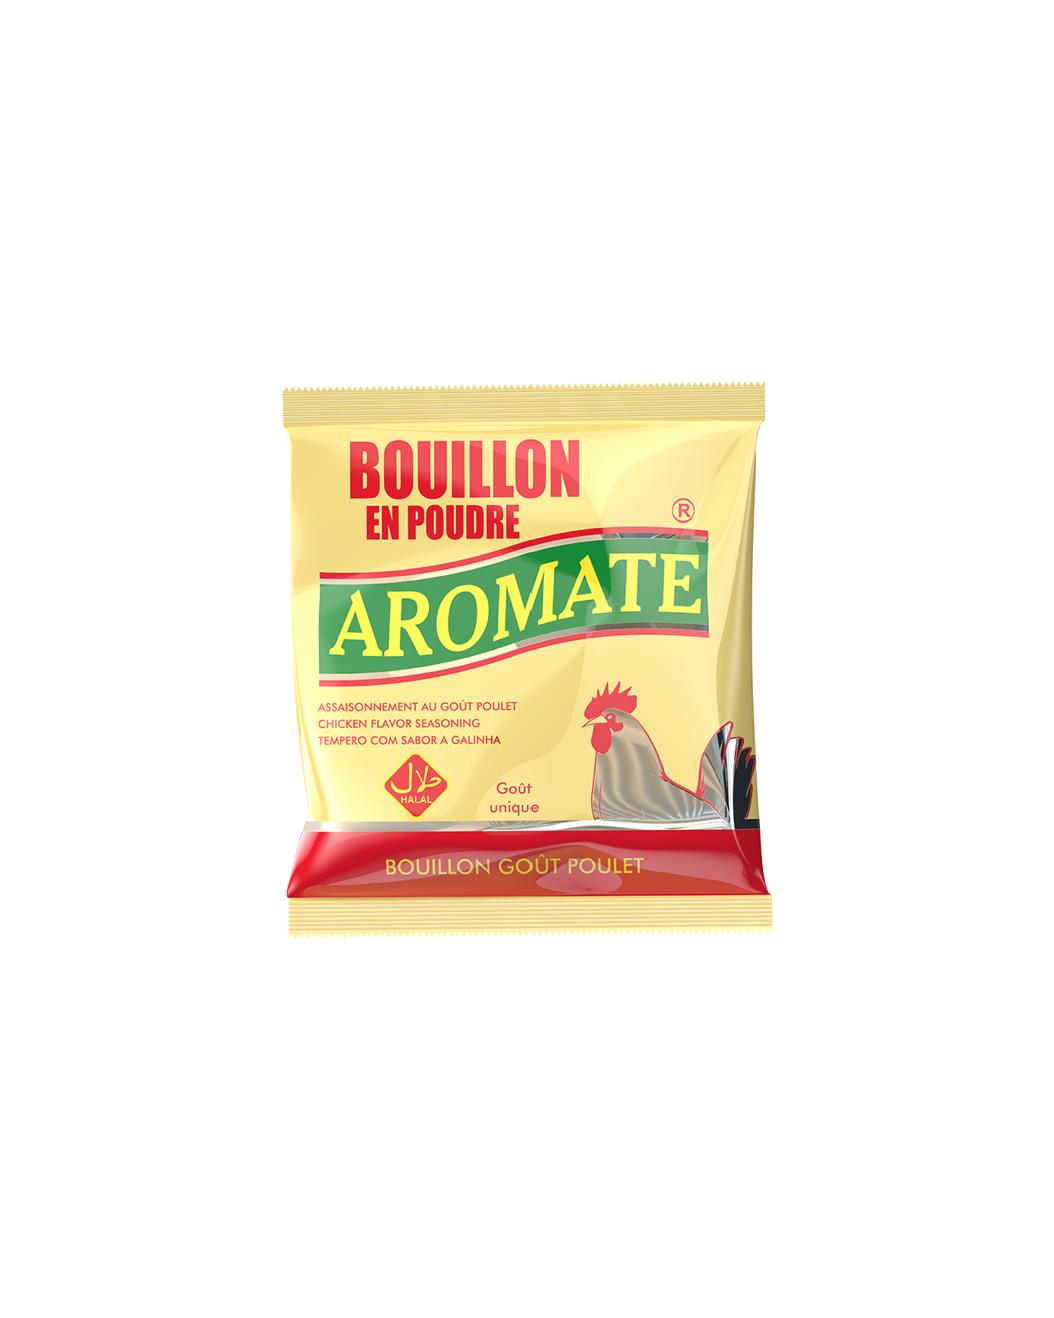 Bouillon AROMATE_Poulet Sachet 75g_Siprochim